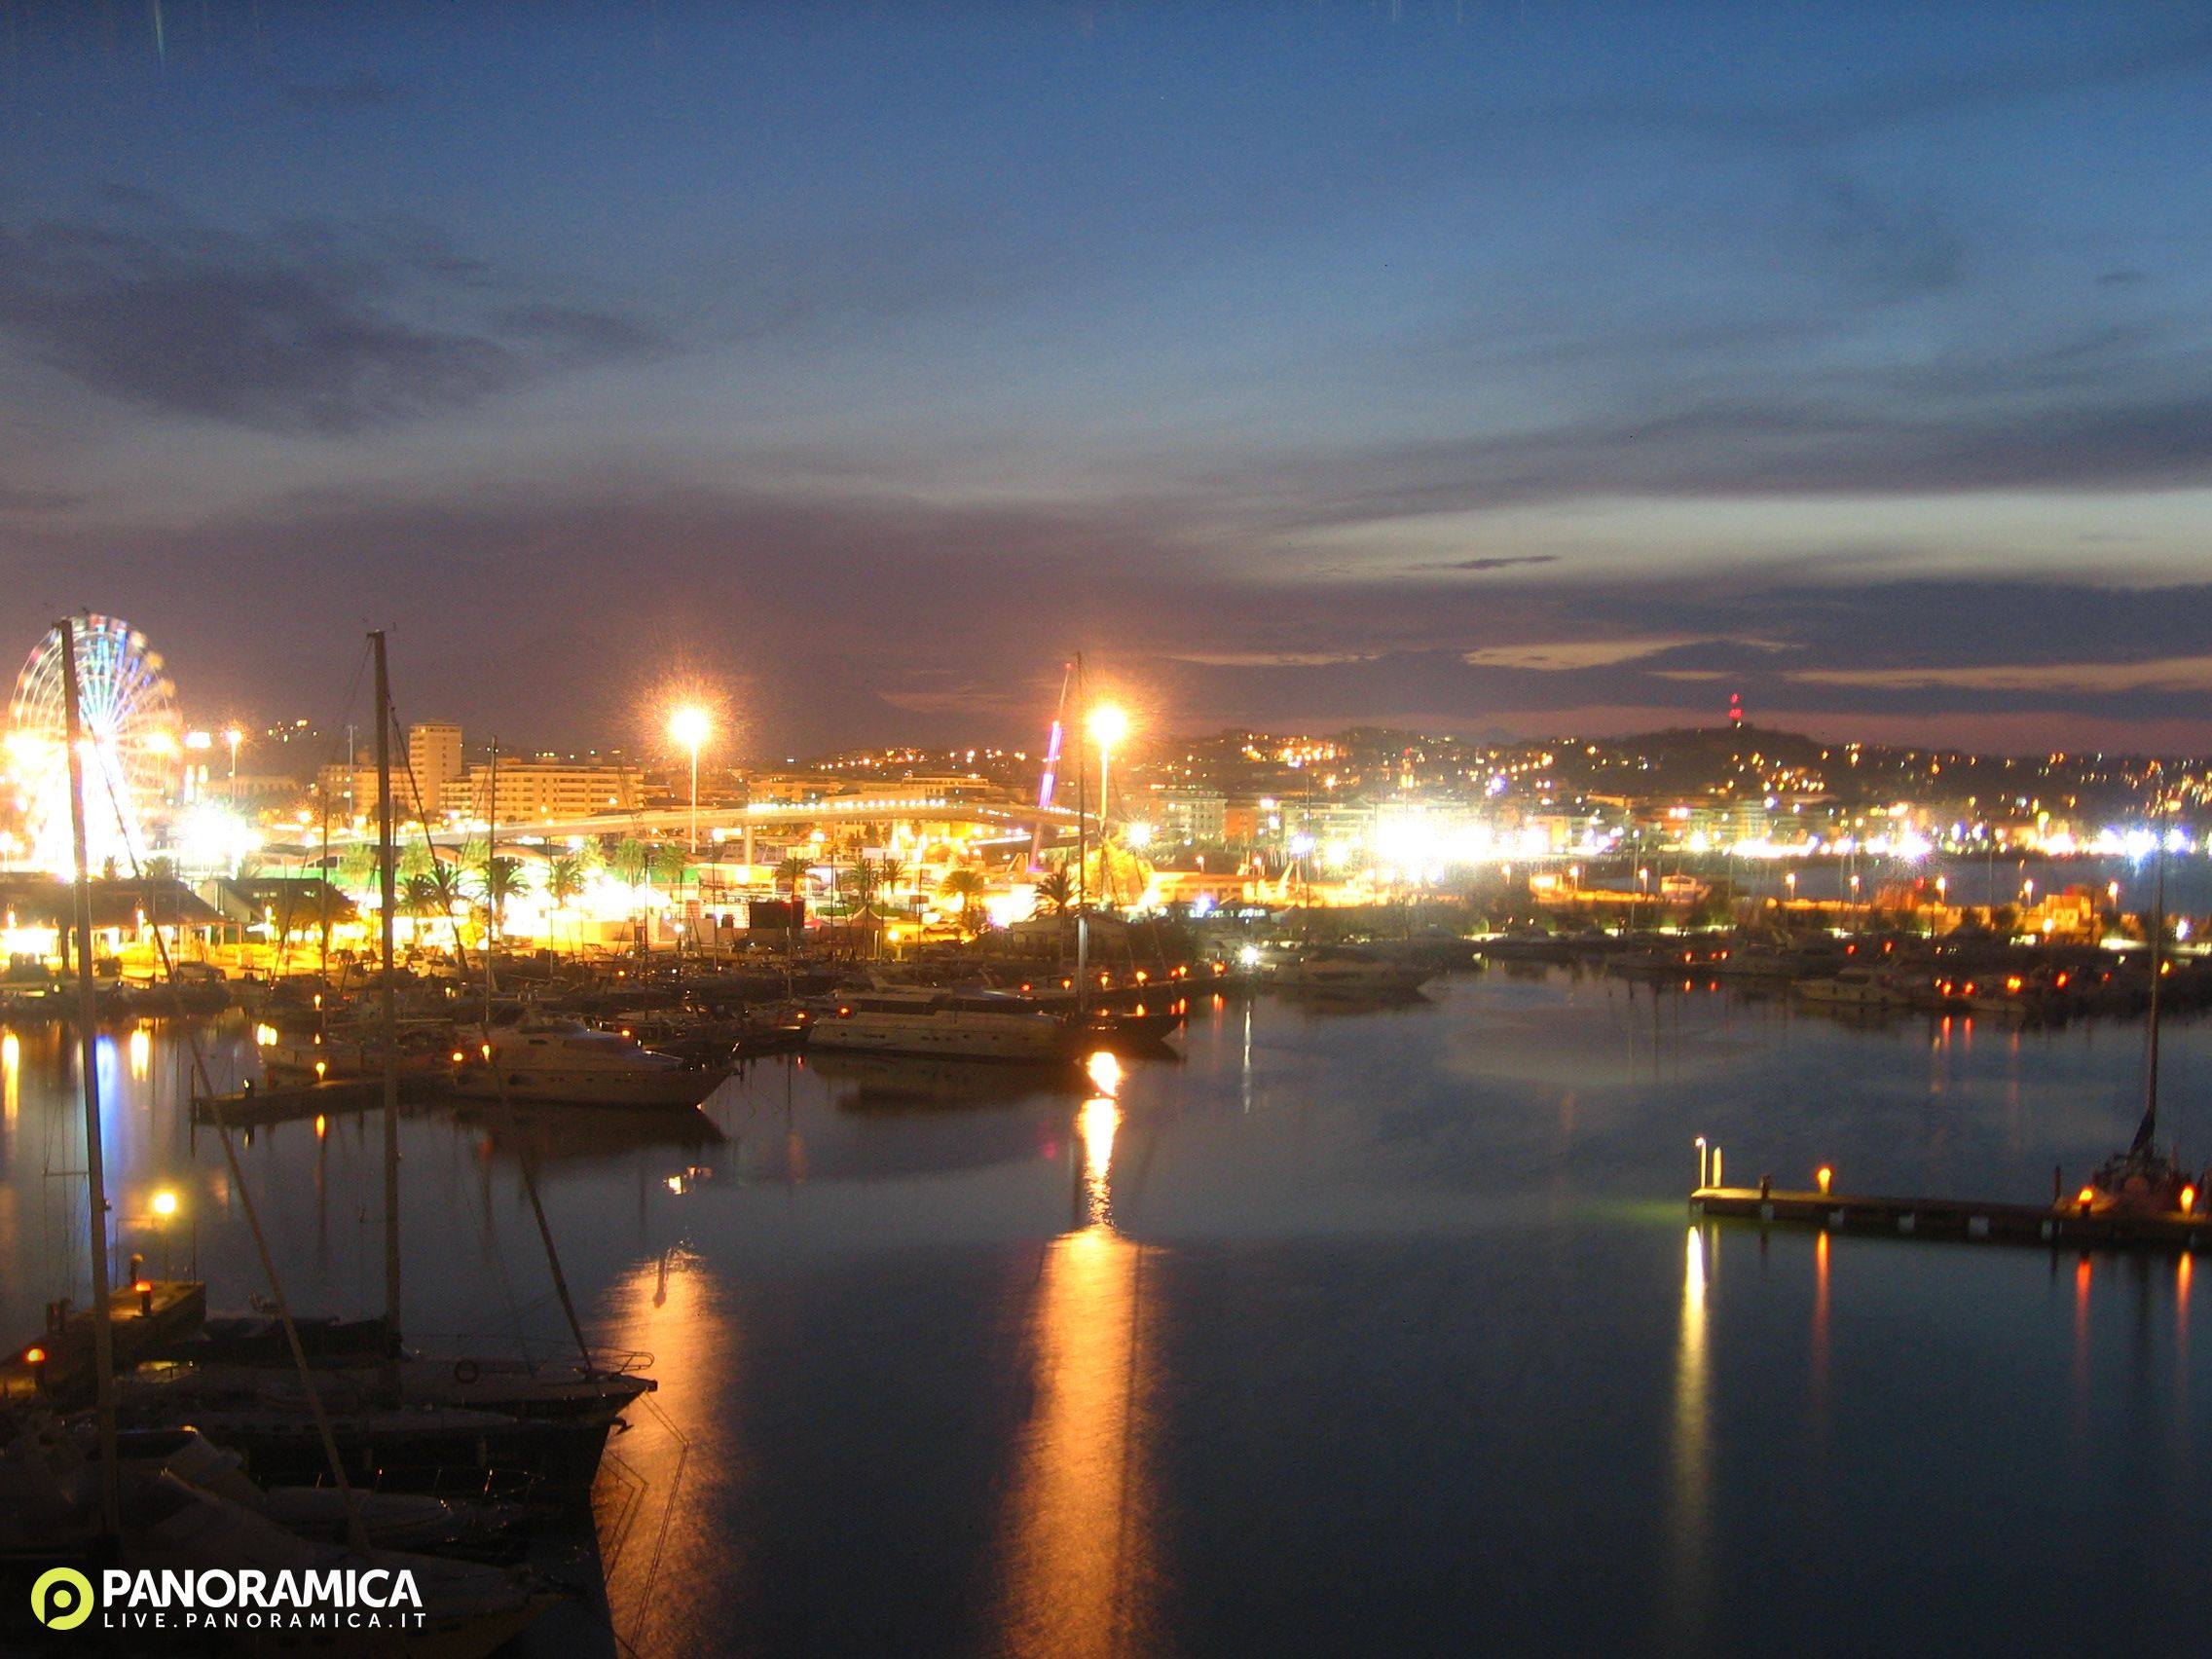 Pescara Camera Live : Pescara live panoramica.it: foto del 16 08 2018 21:00